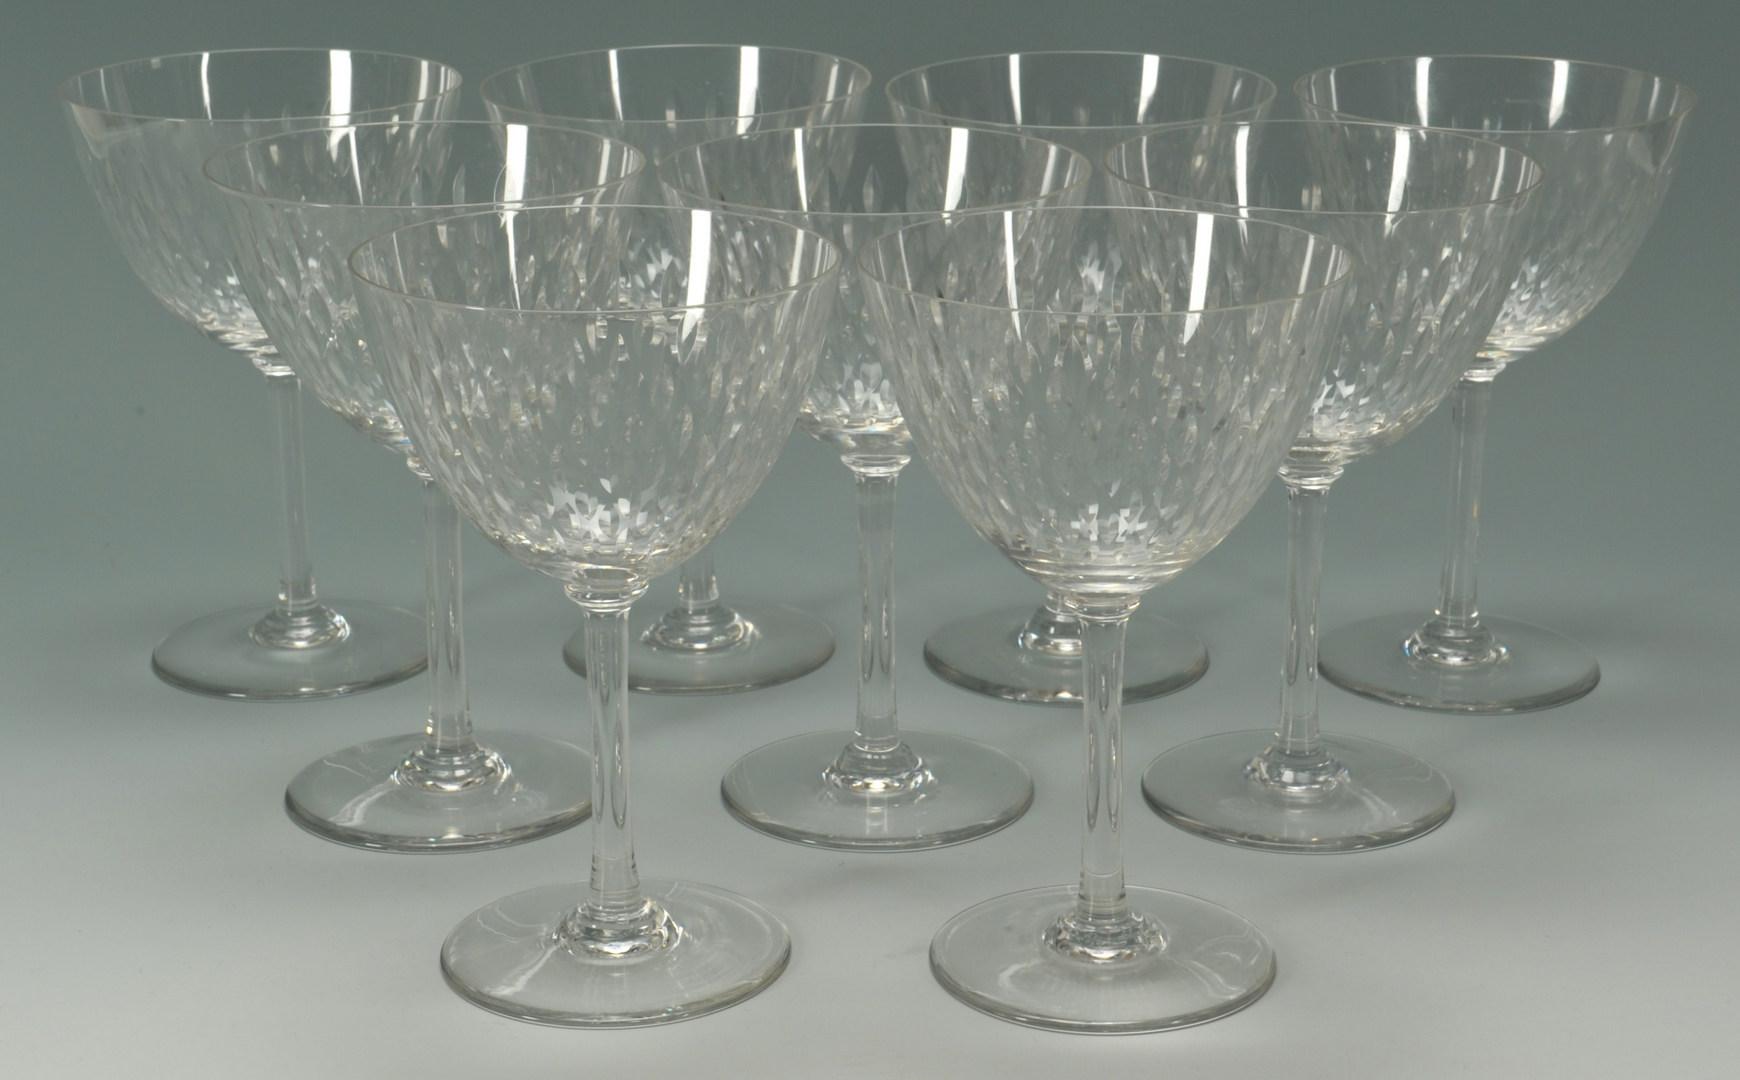 Lot 265 baccarat crystal water goblets paris pattern 9 t - Baccarat stemware ...